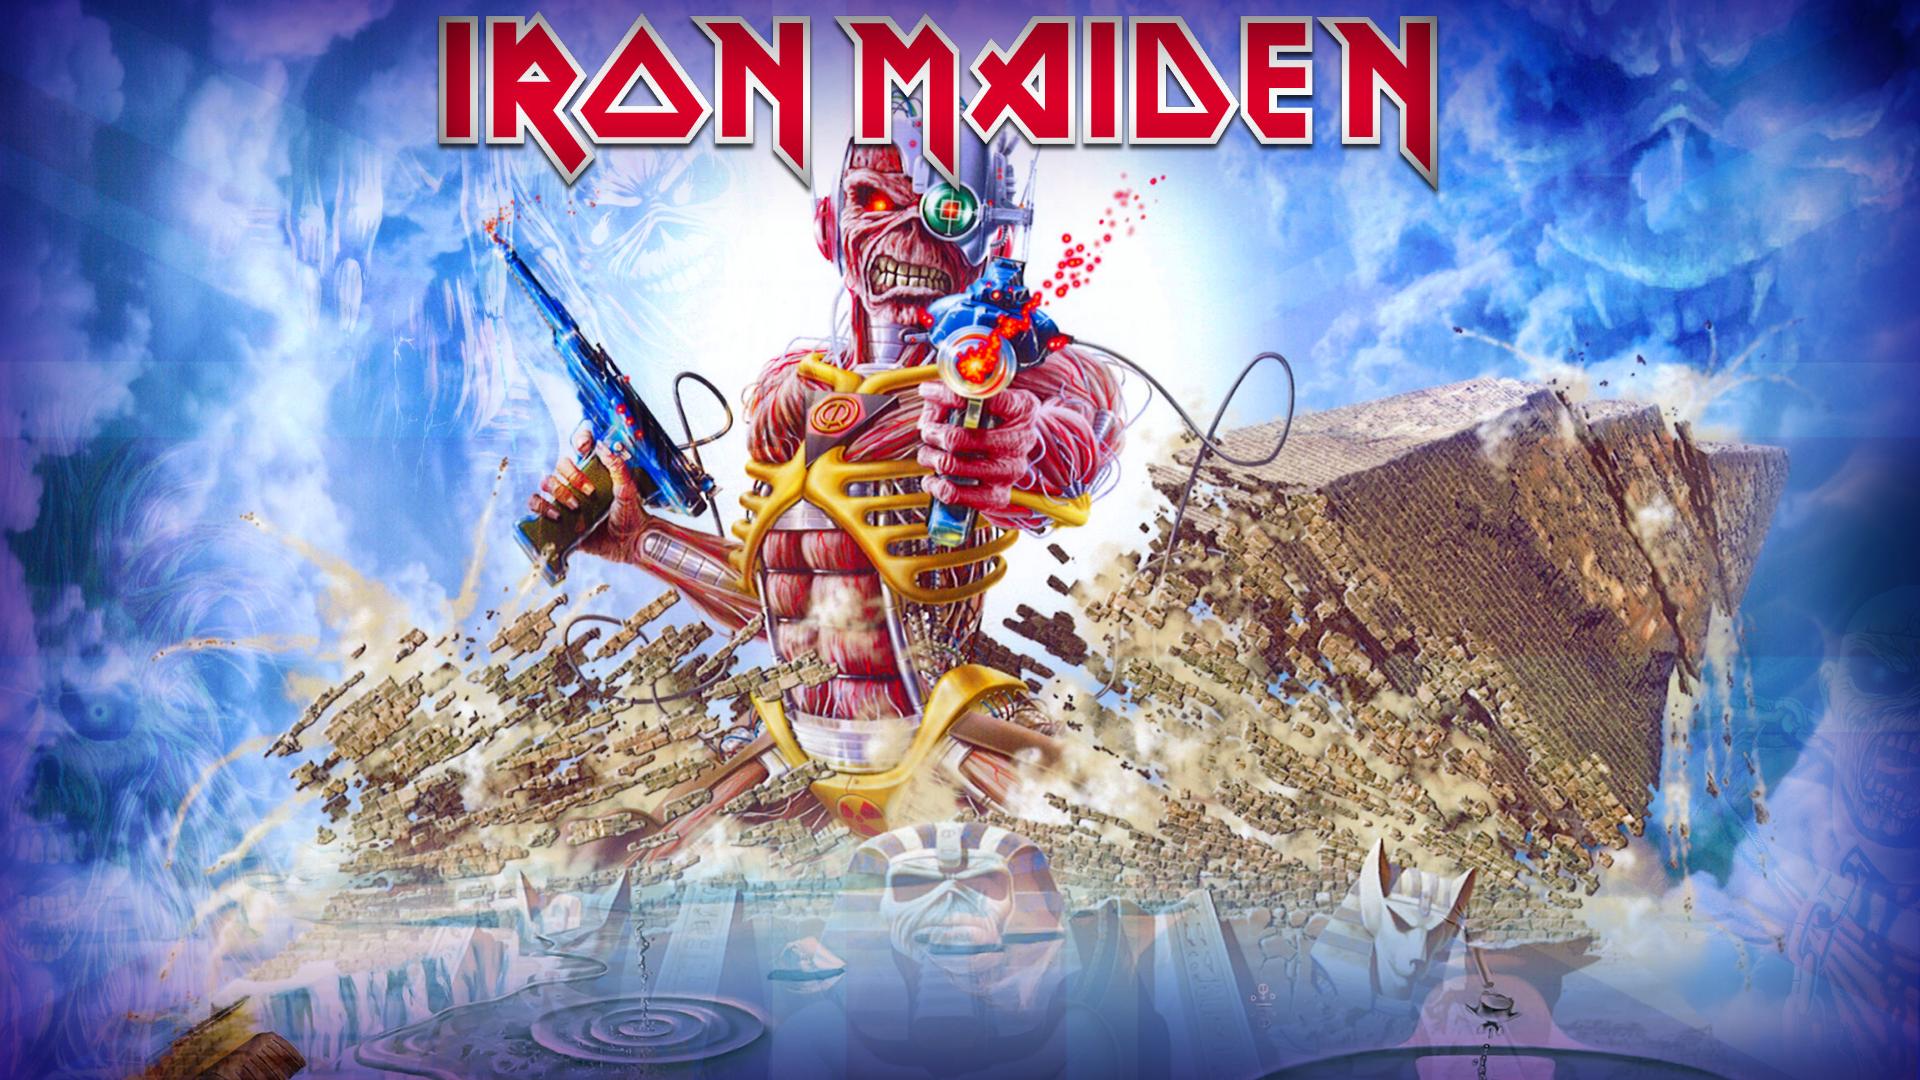 Iron Maiden Wallpaper Desktop Background Click Wallpapers Iron Maiden Iron Maiden Album Covers Iron Maiden Albums